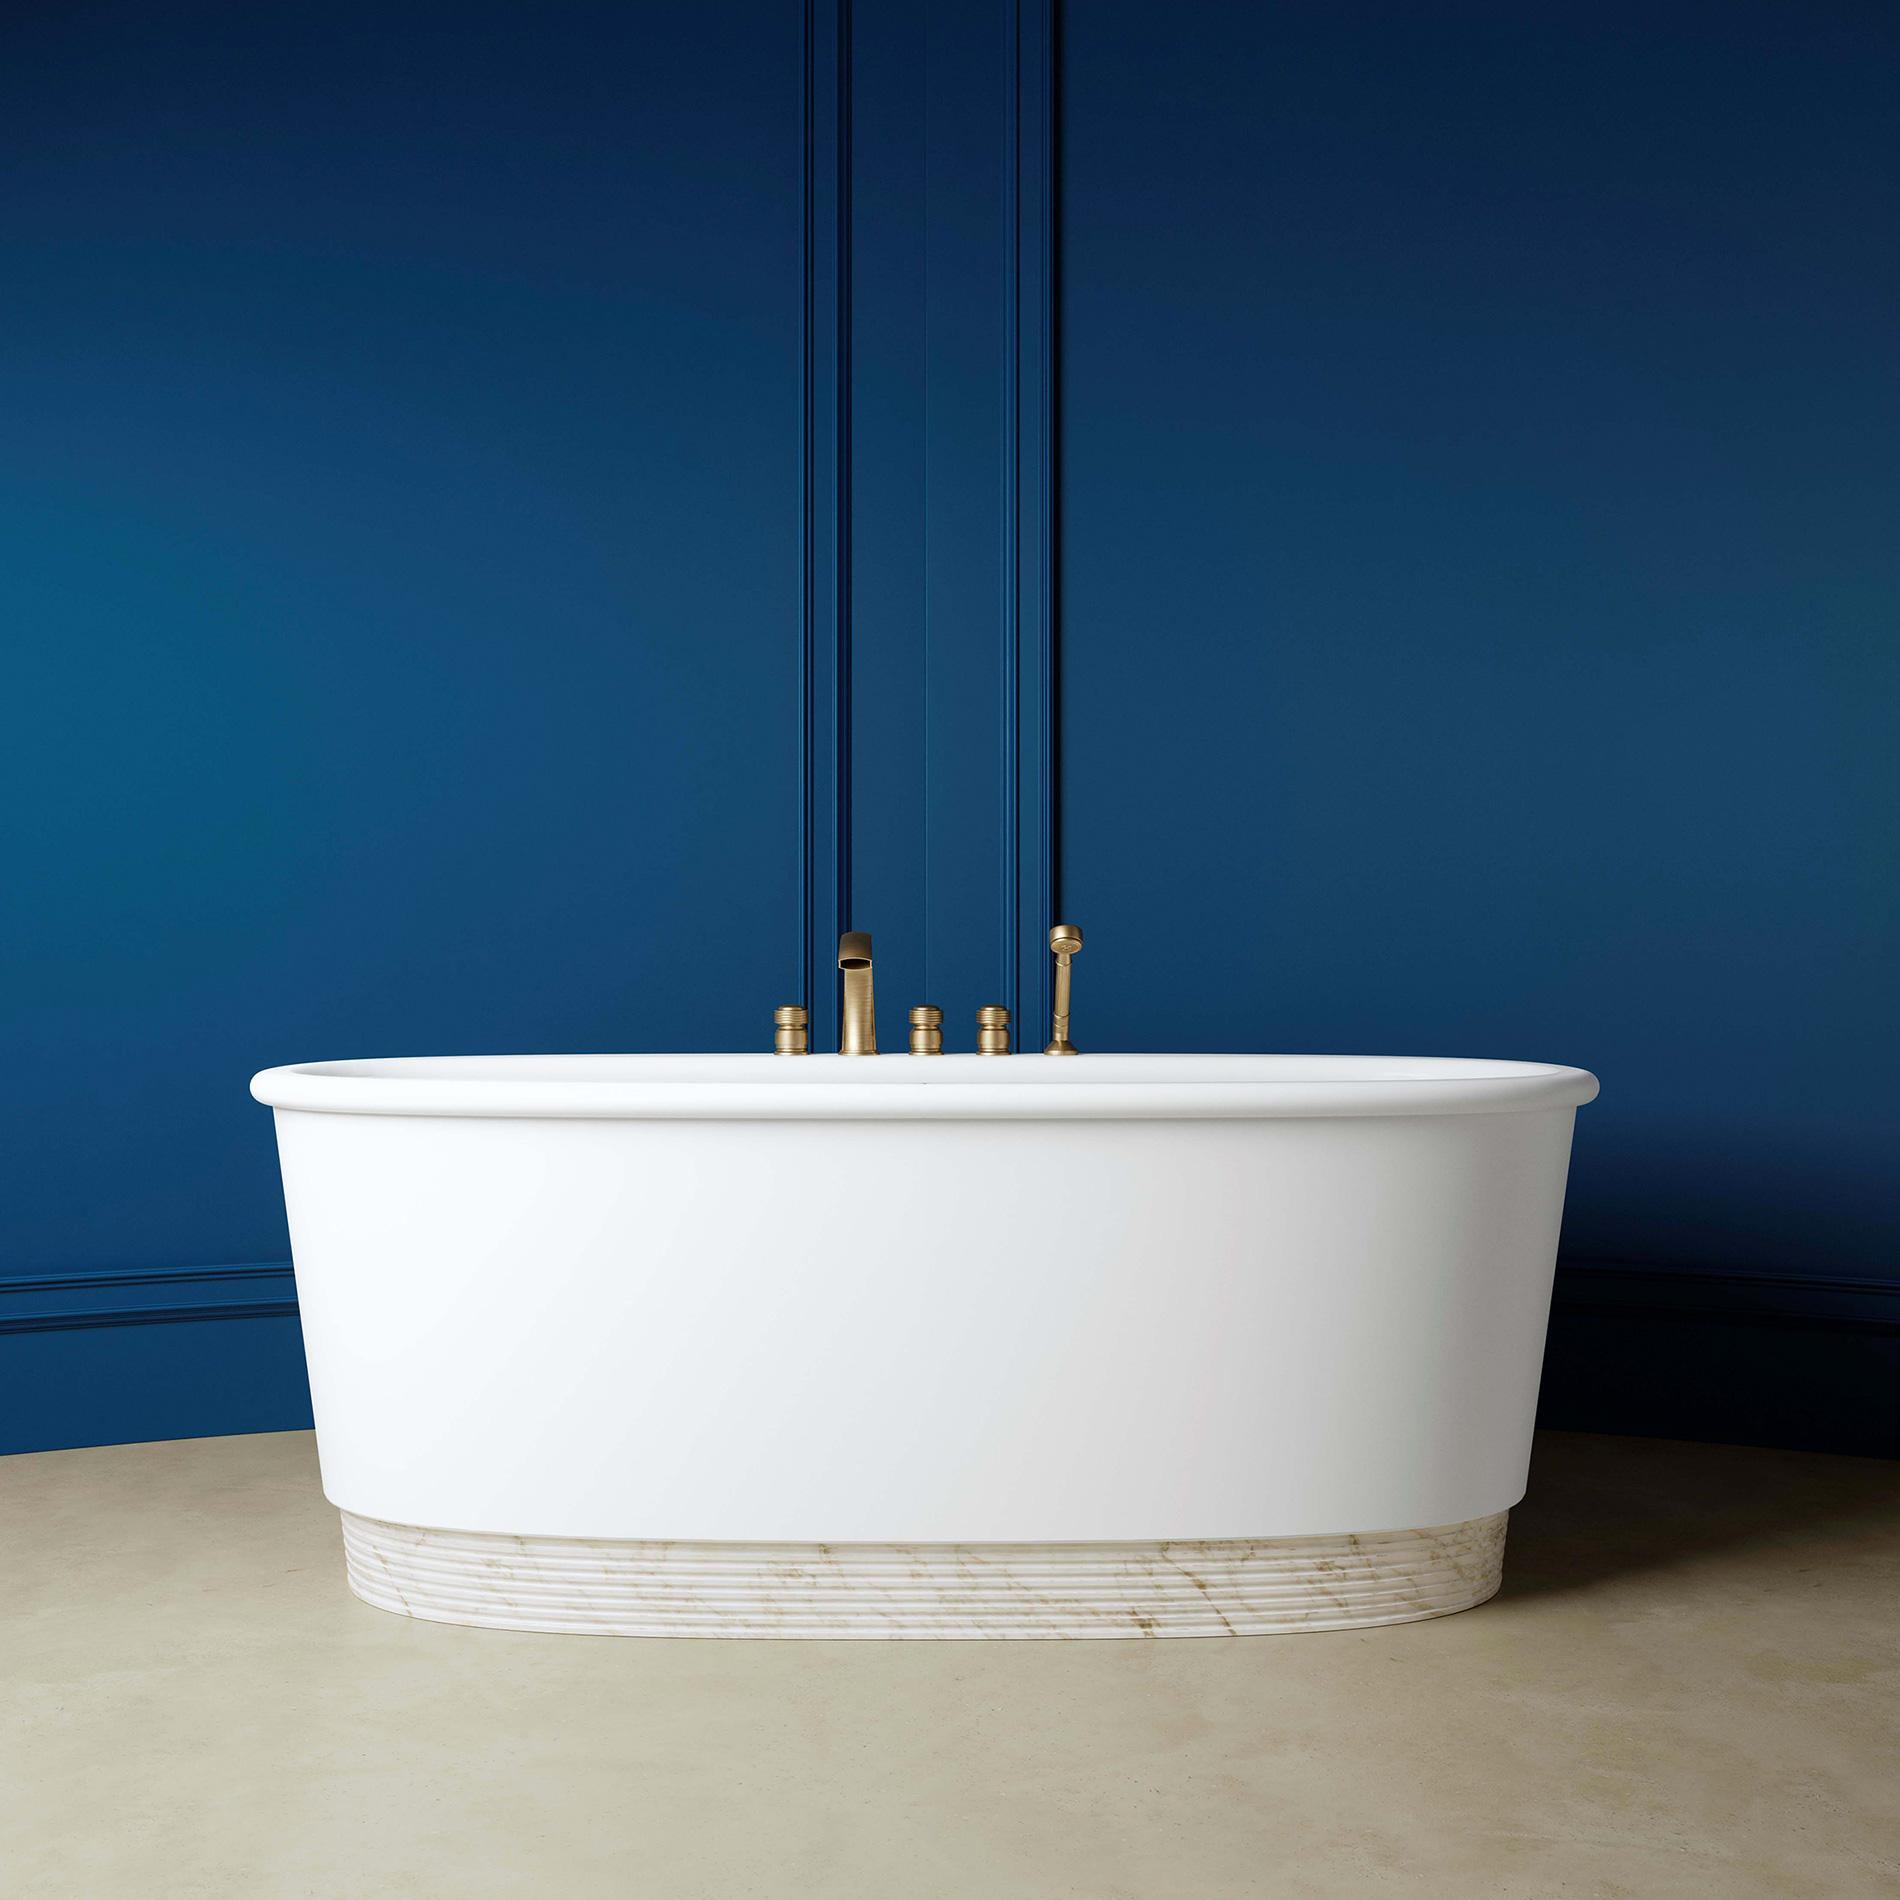 Nicos-International-home-products-Devon-Devon-tub-1